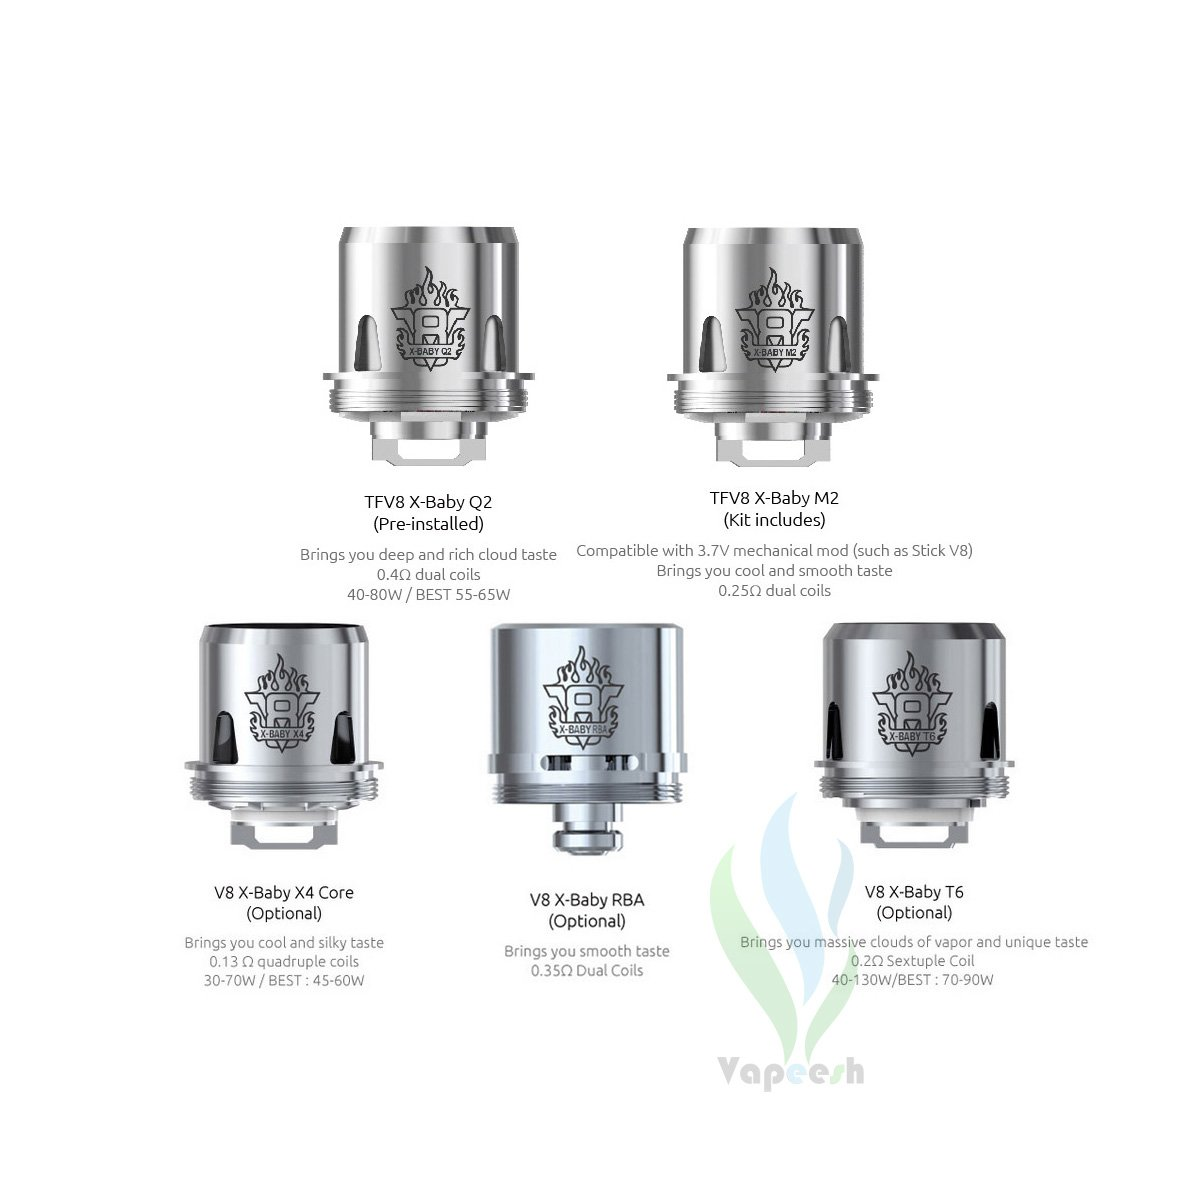 Smok TFV8 X-Baby Tank Coil Heads